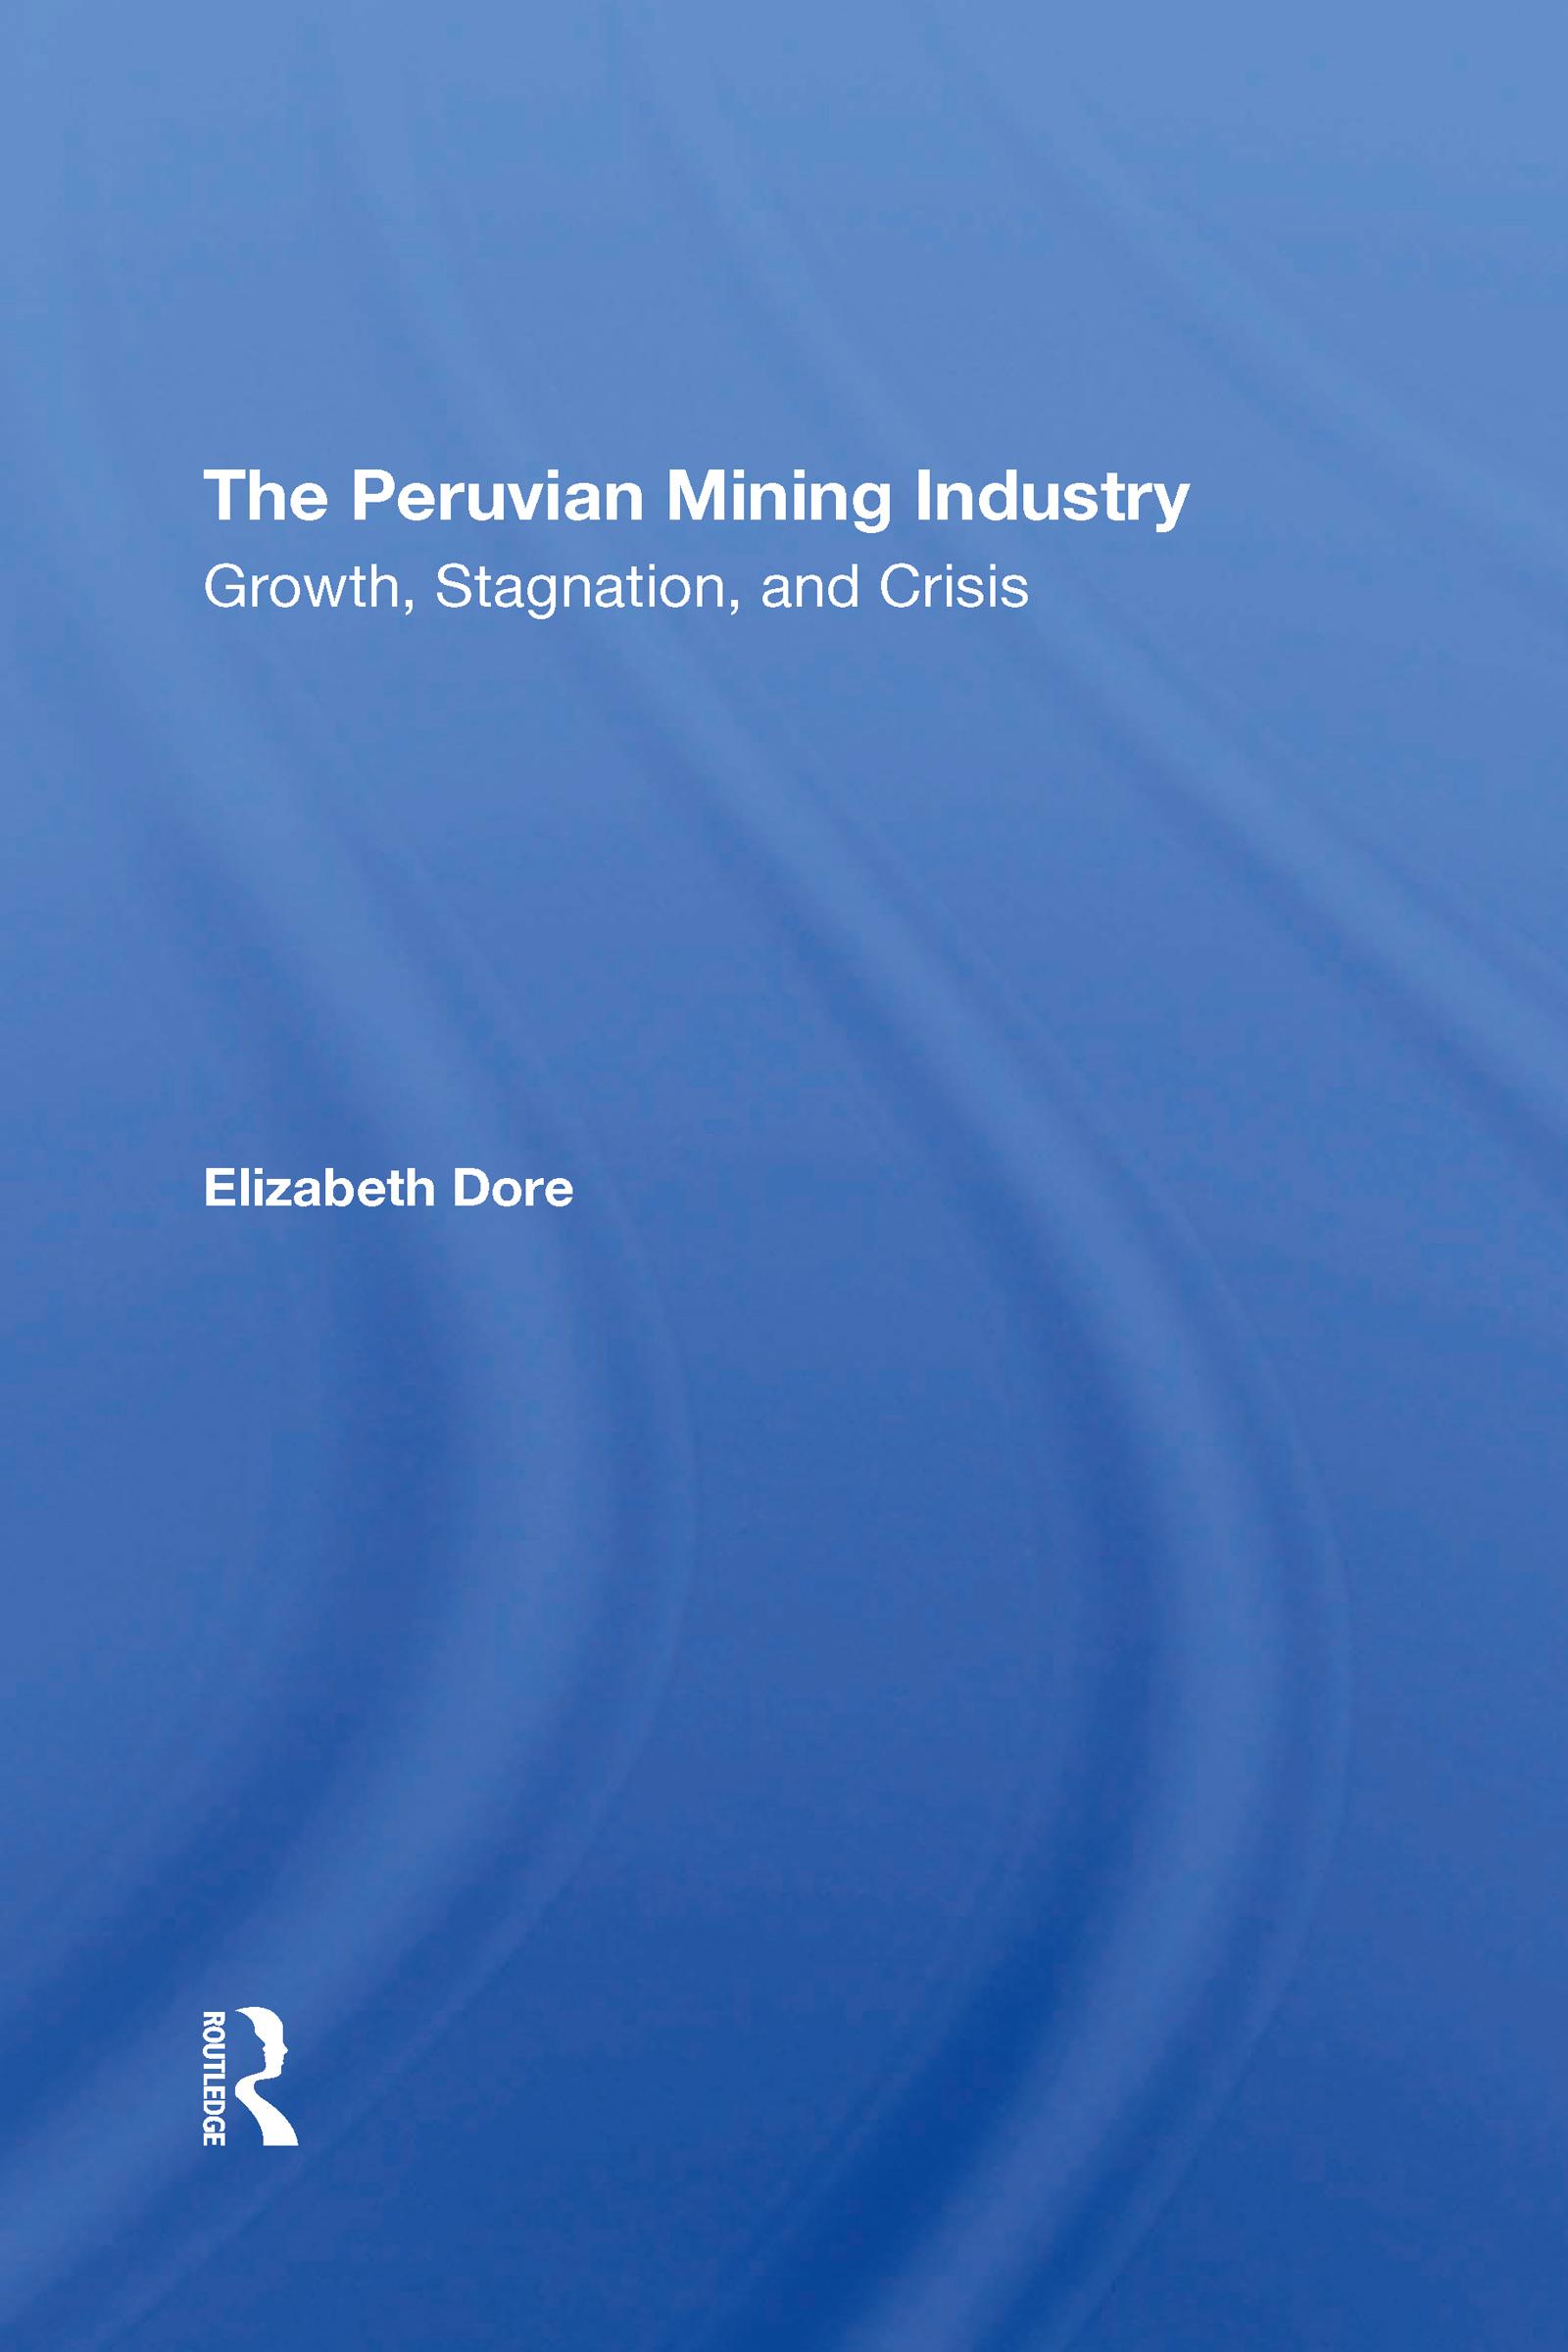 The Peruvian Mining Industry